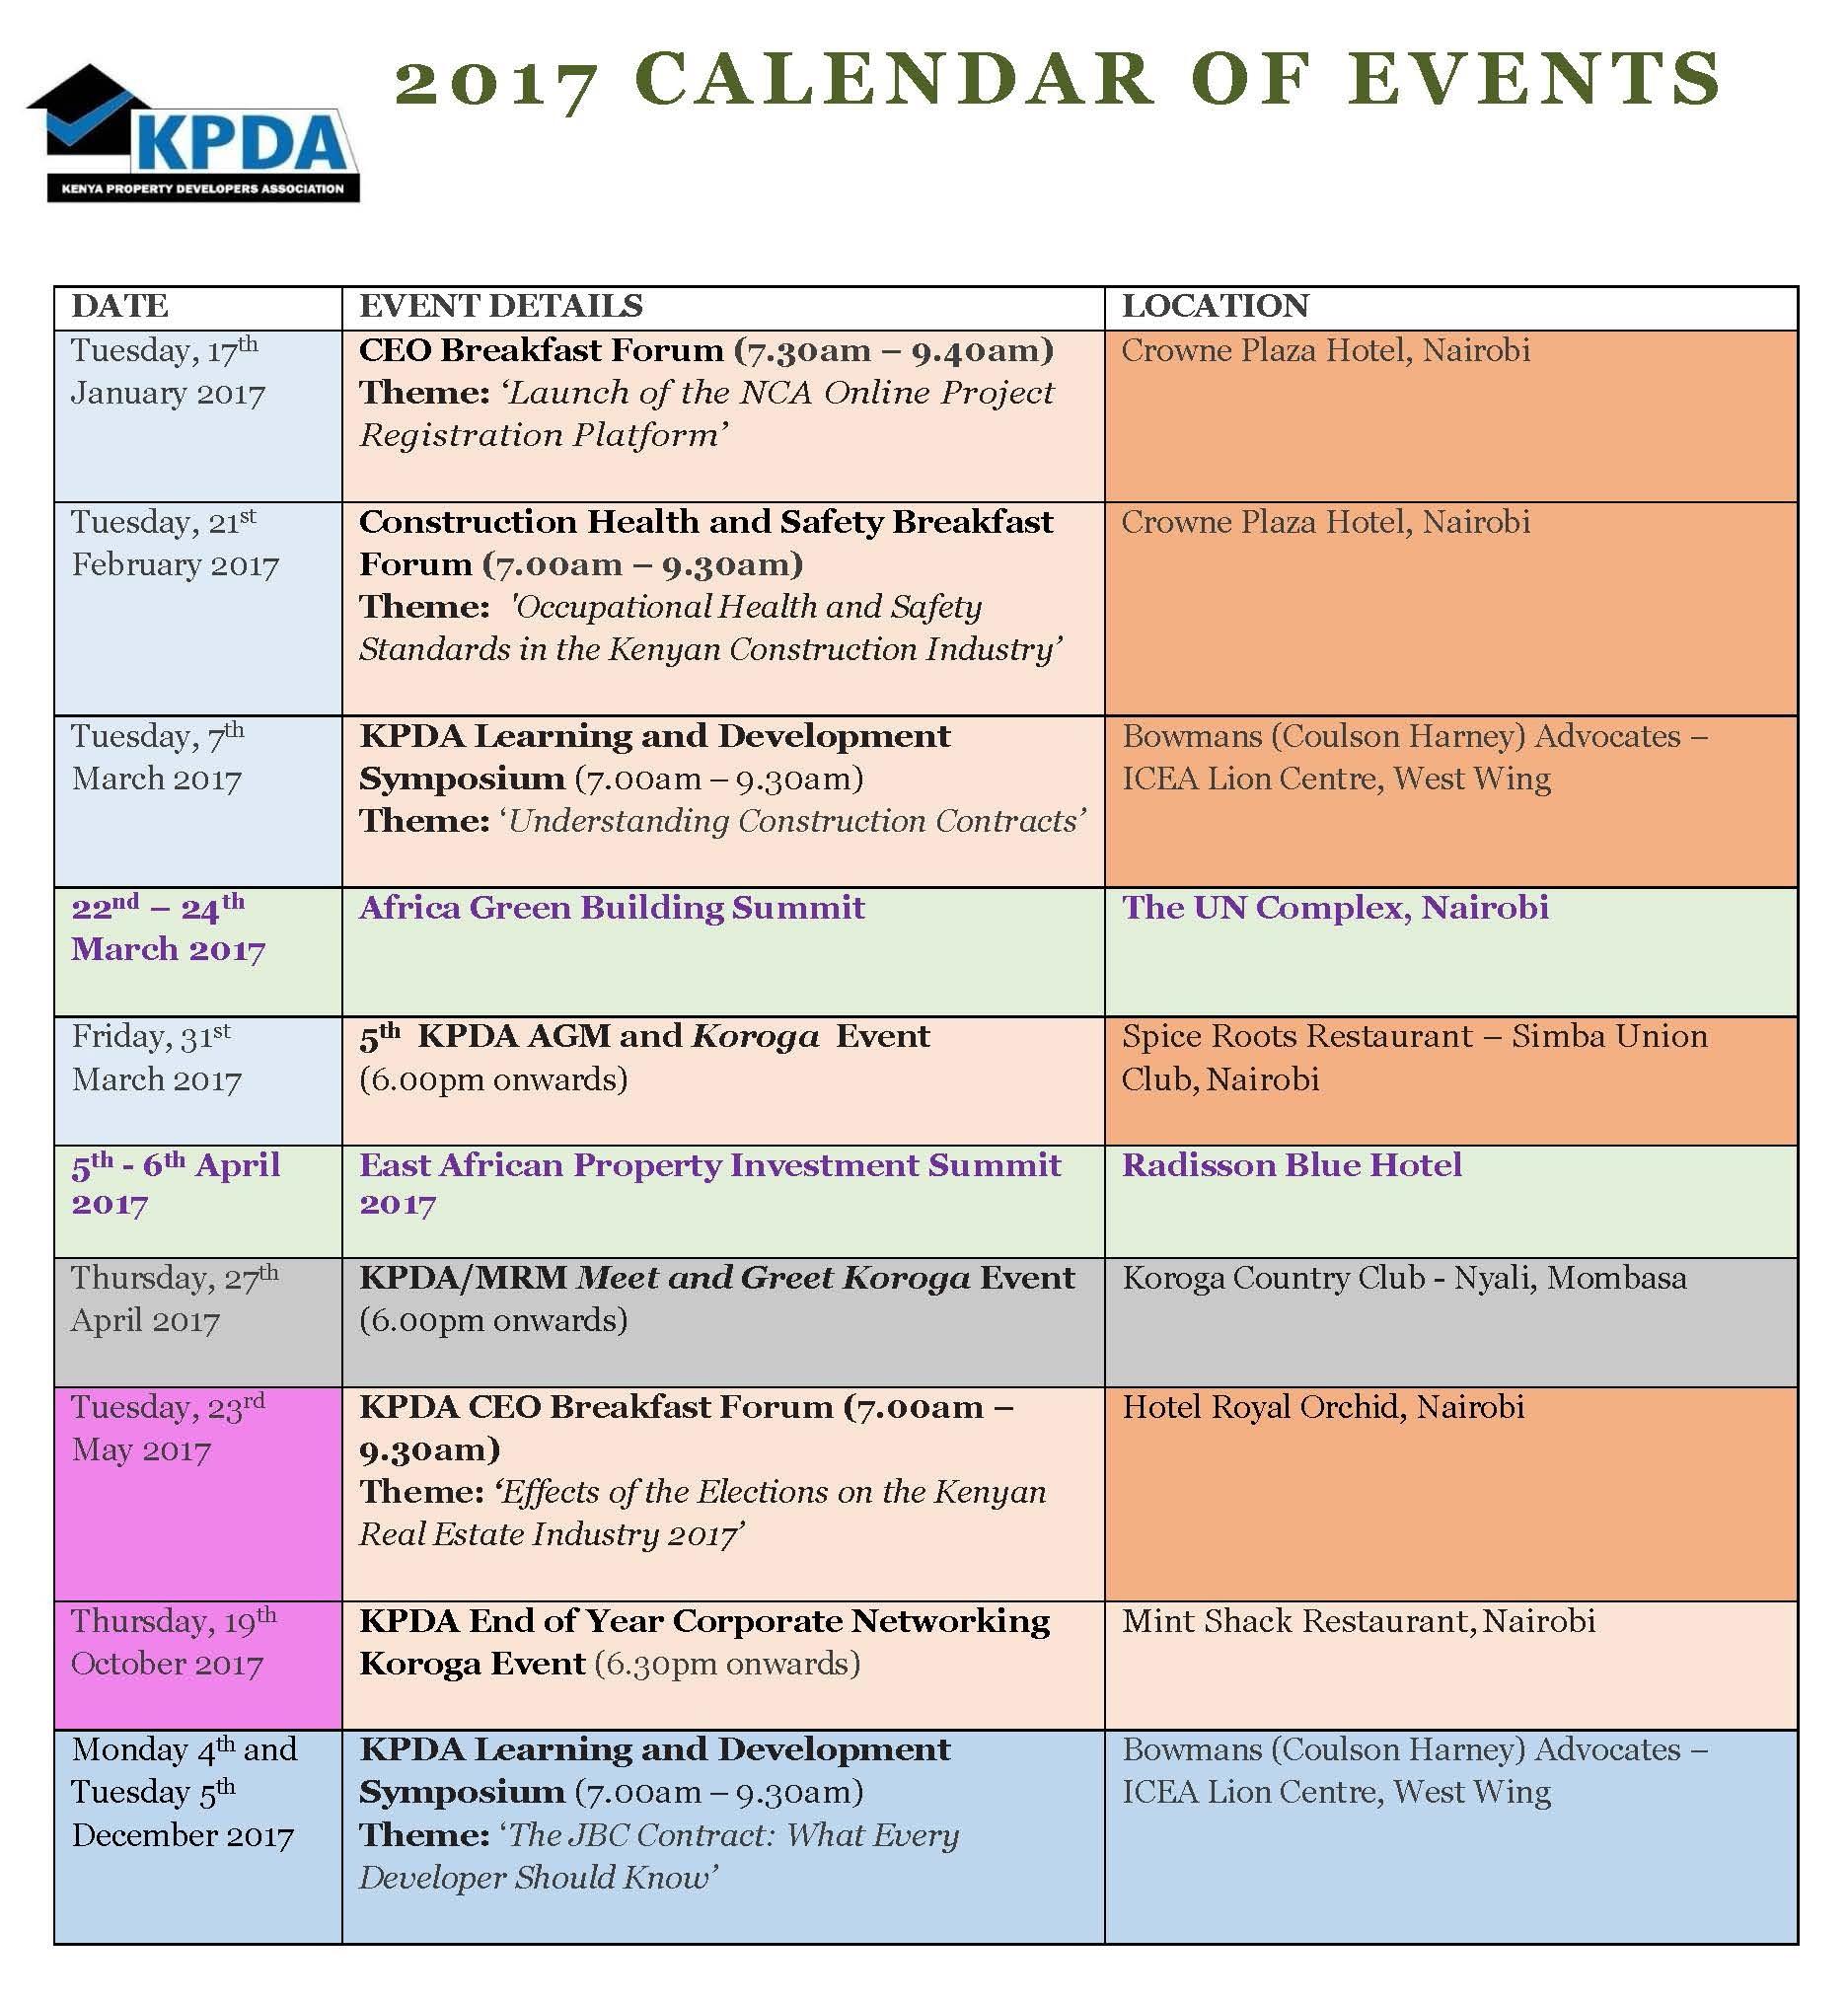 2017 Kpda Calendar Of Events – Kenya Property Developers Association_Calendar Printing In Kenya